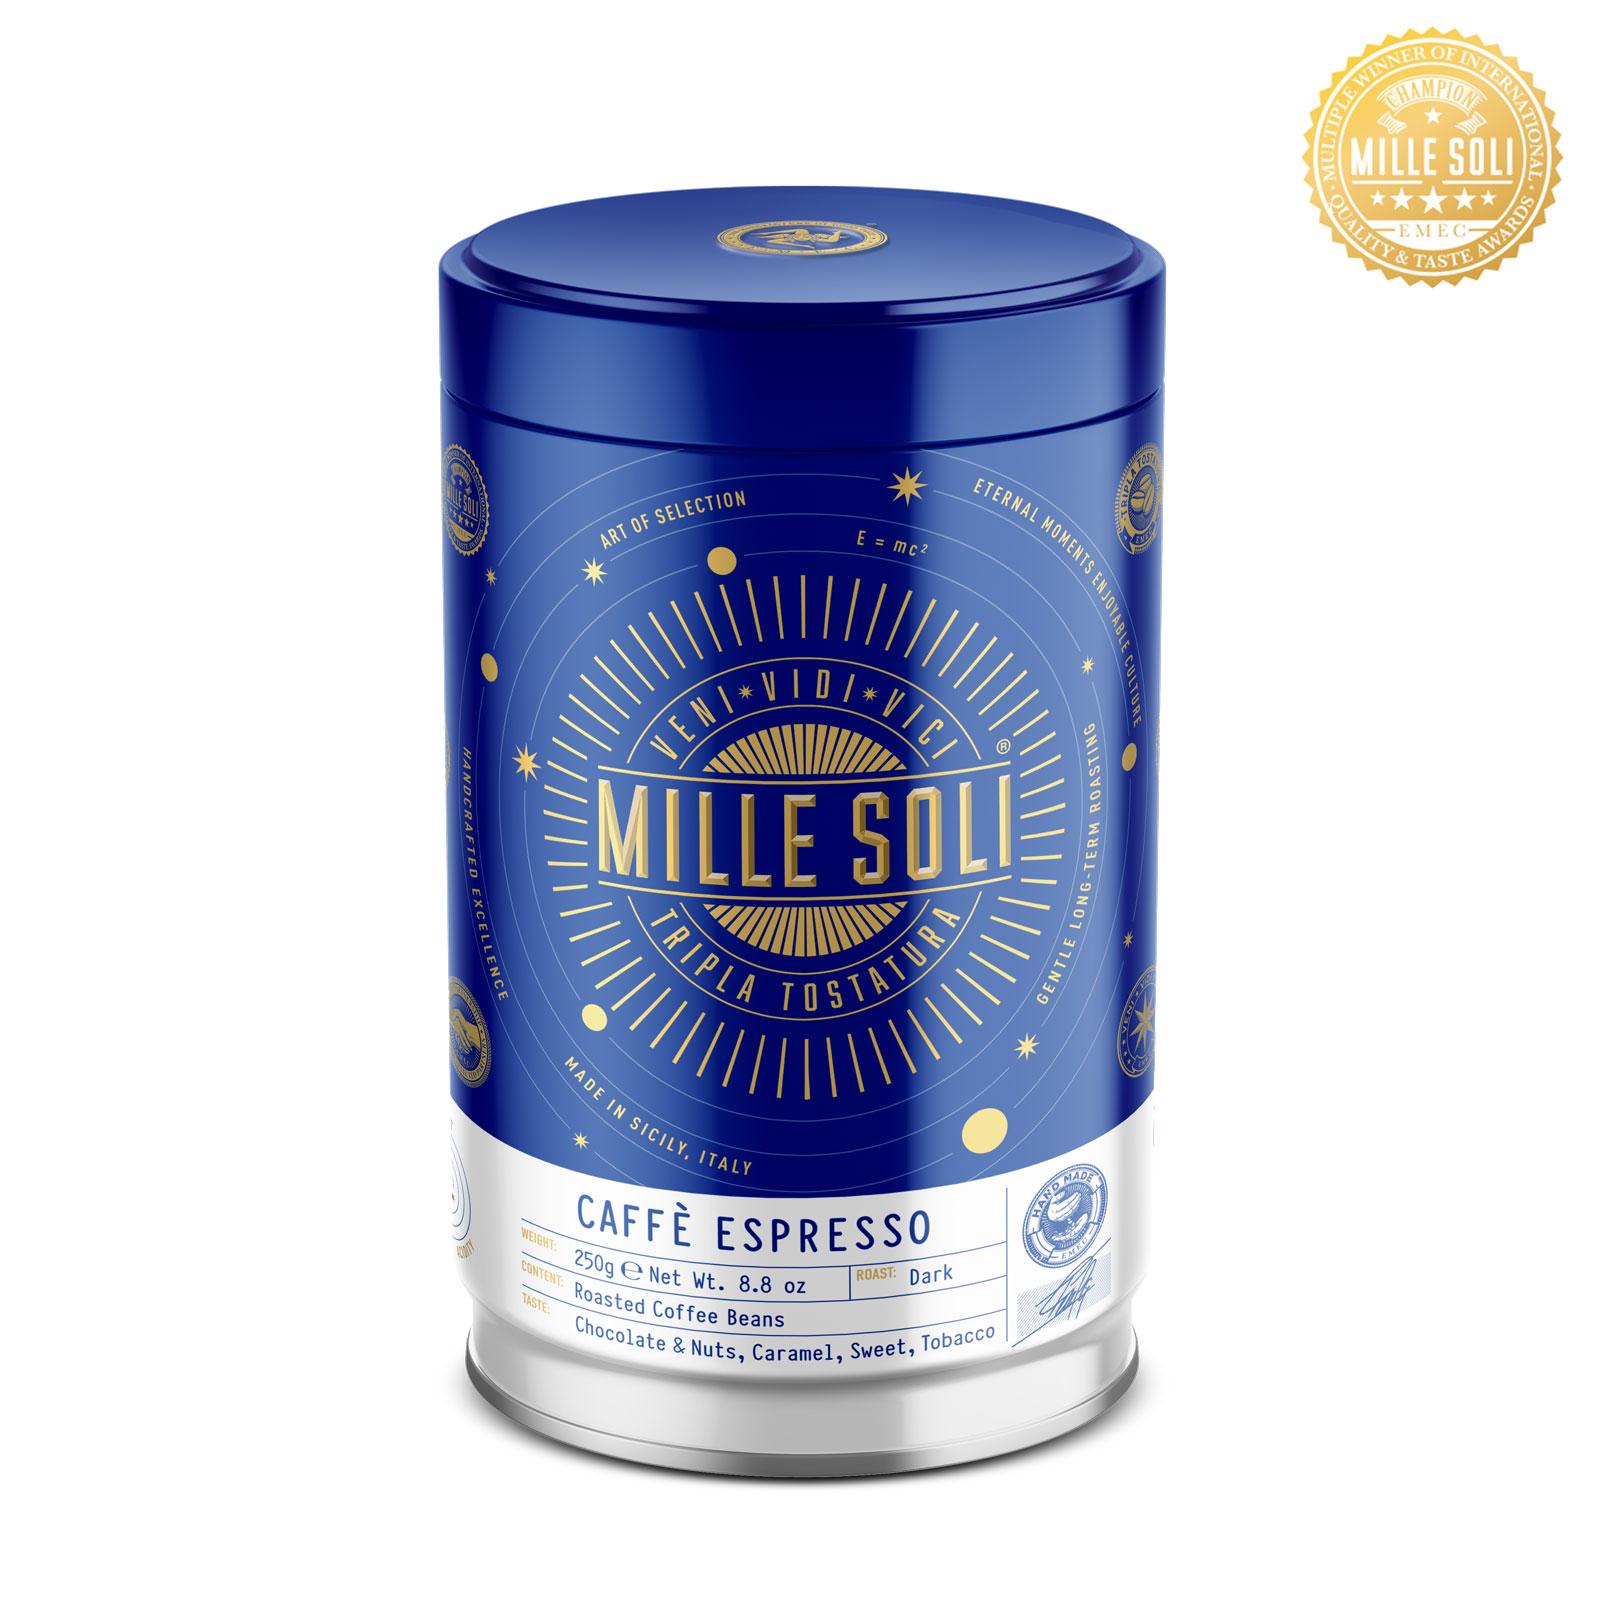 MILLE SOLI - Caffè Espresso - 250g - Bohnen